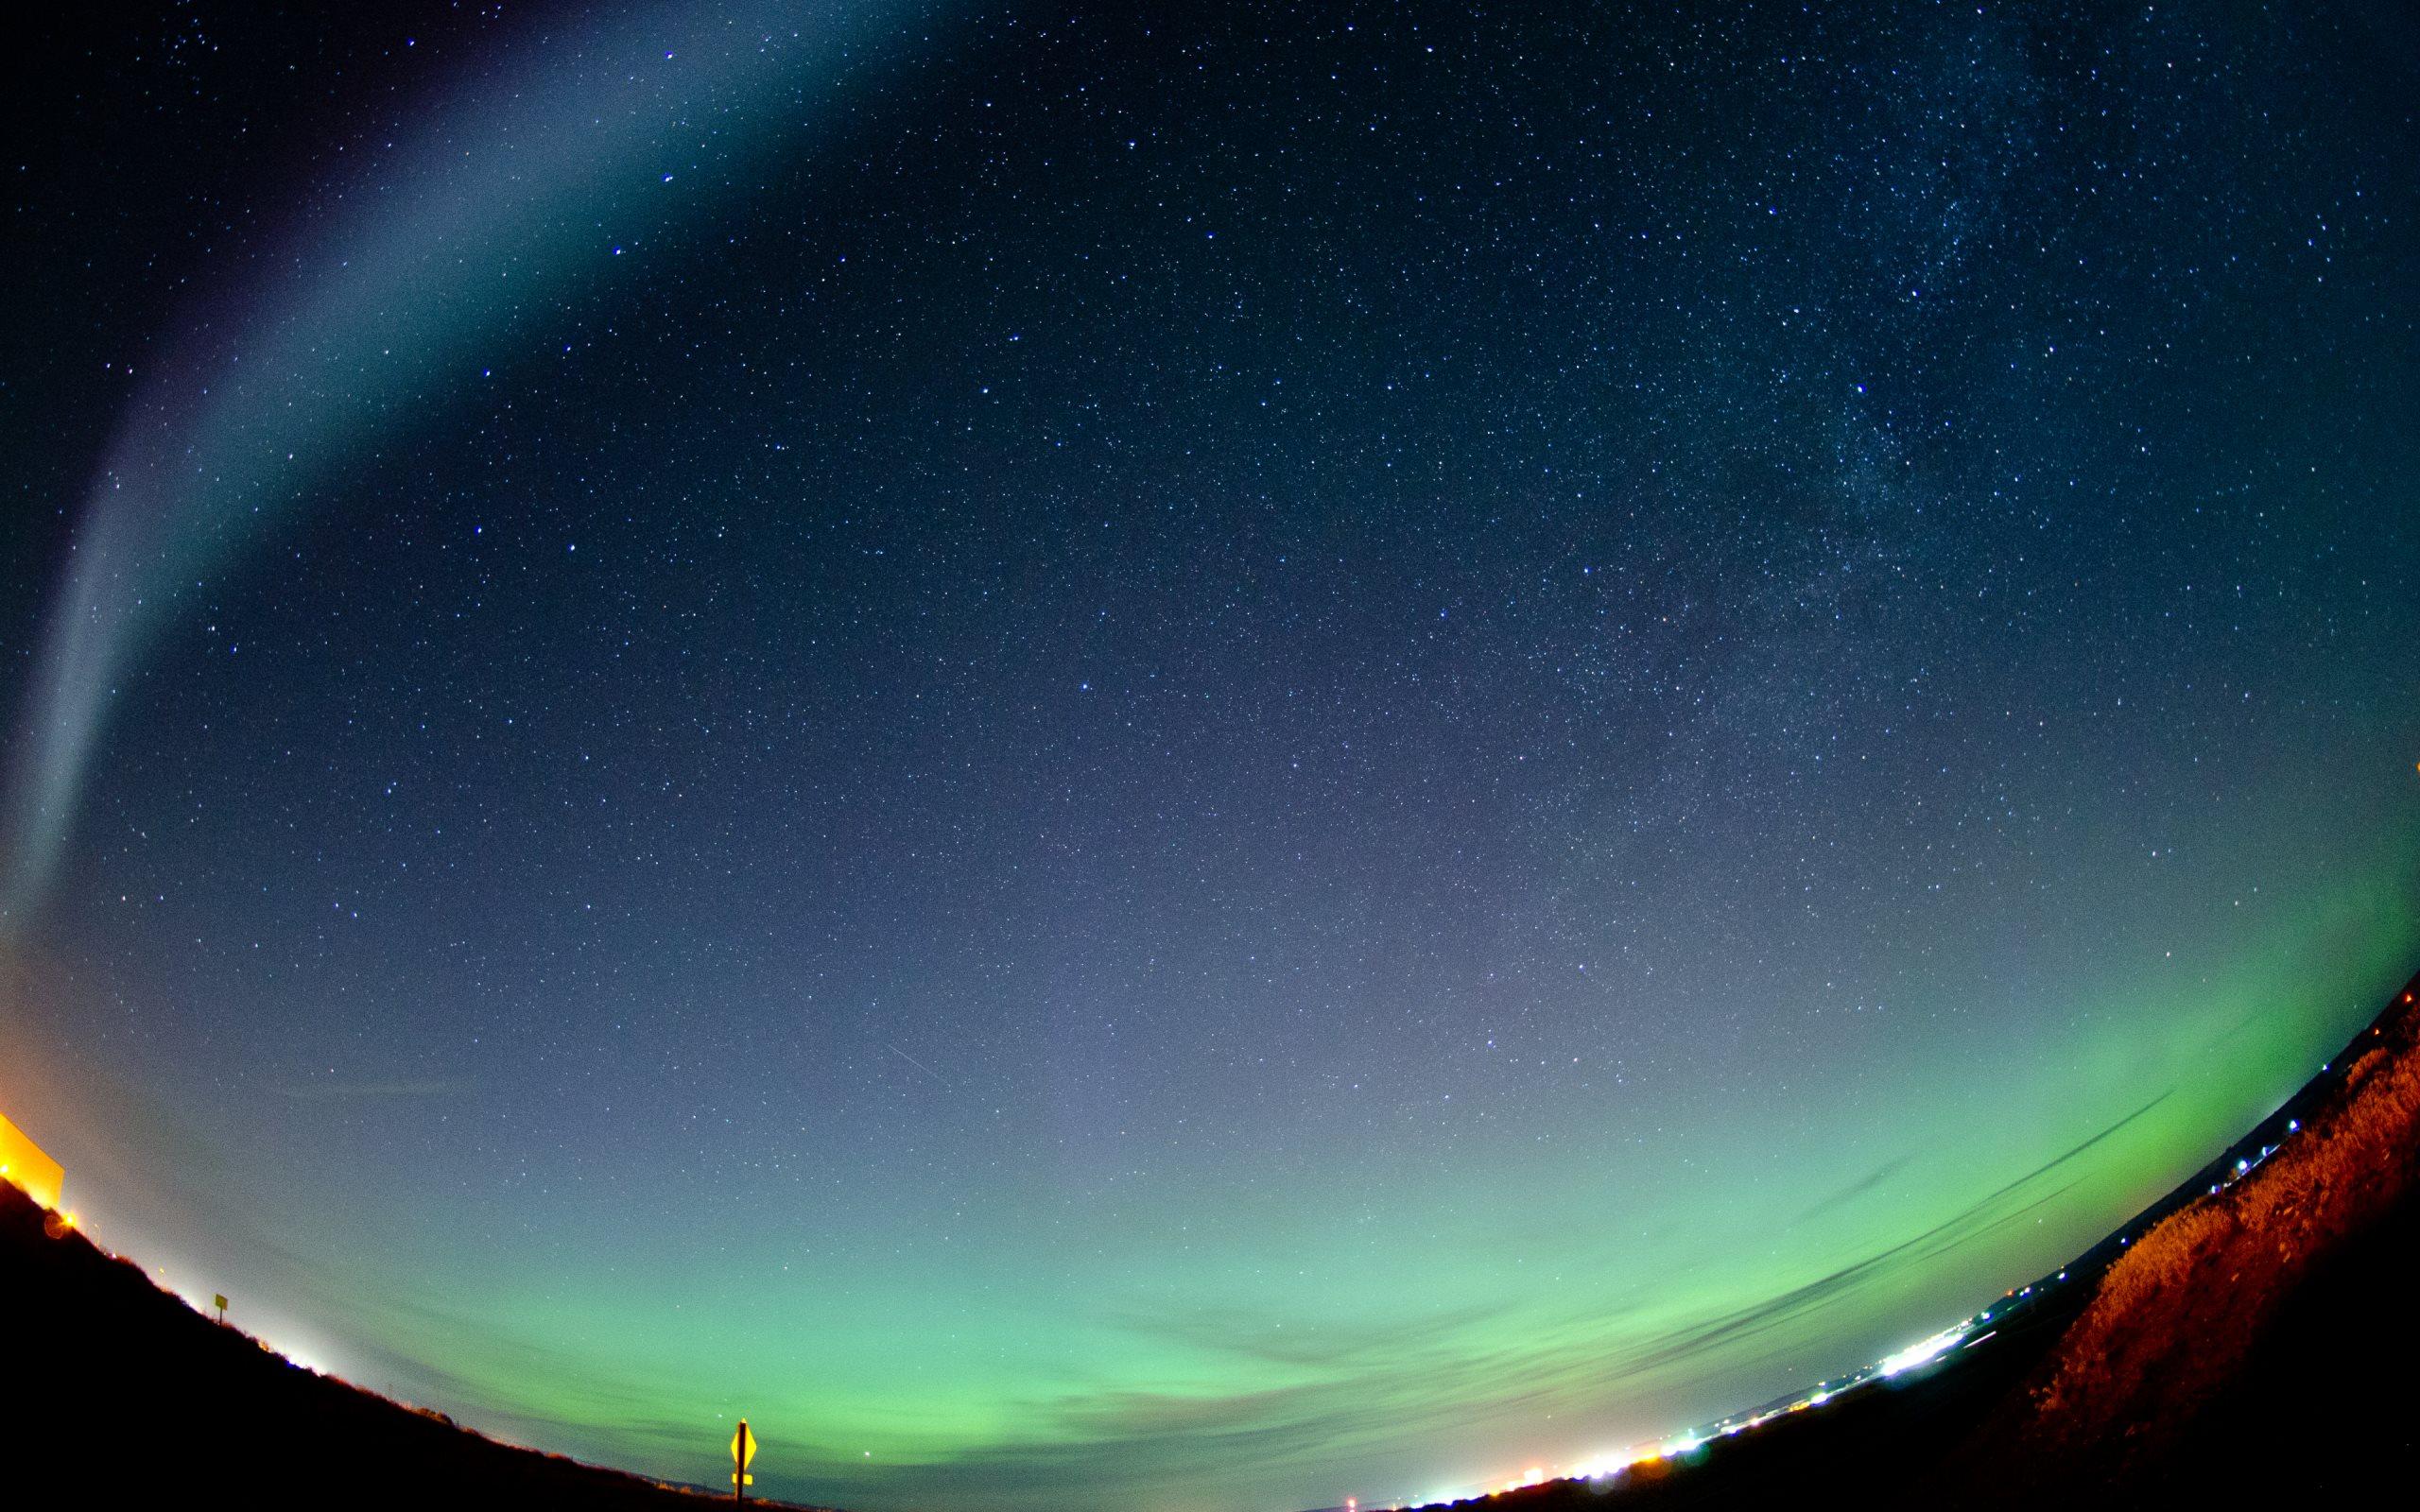 northern lights wallpaper 4k - photo #19